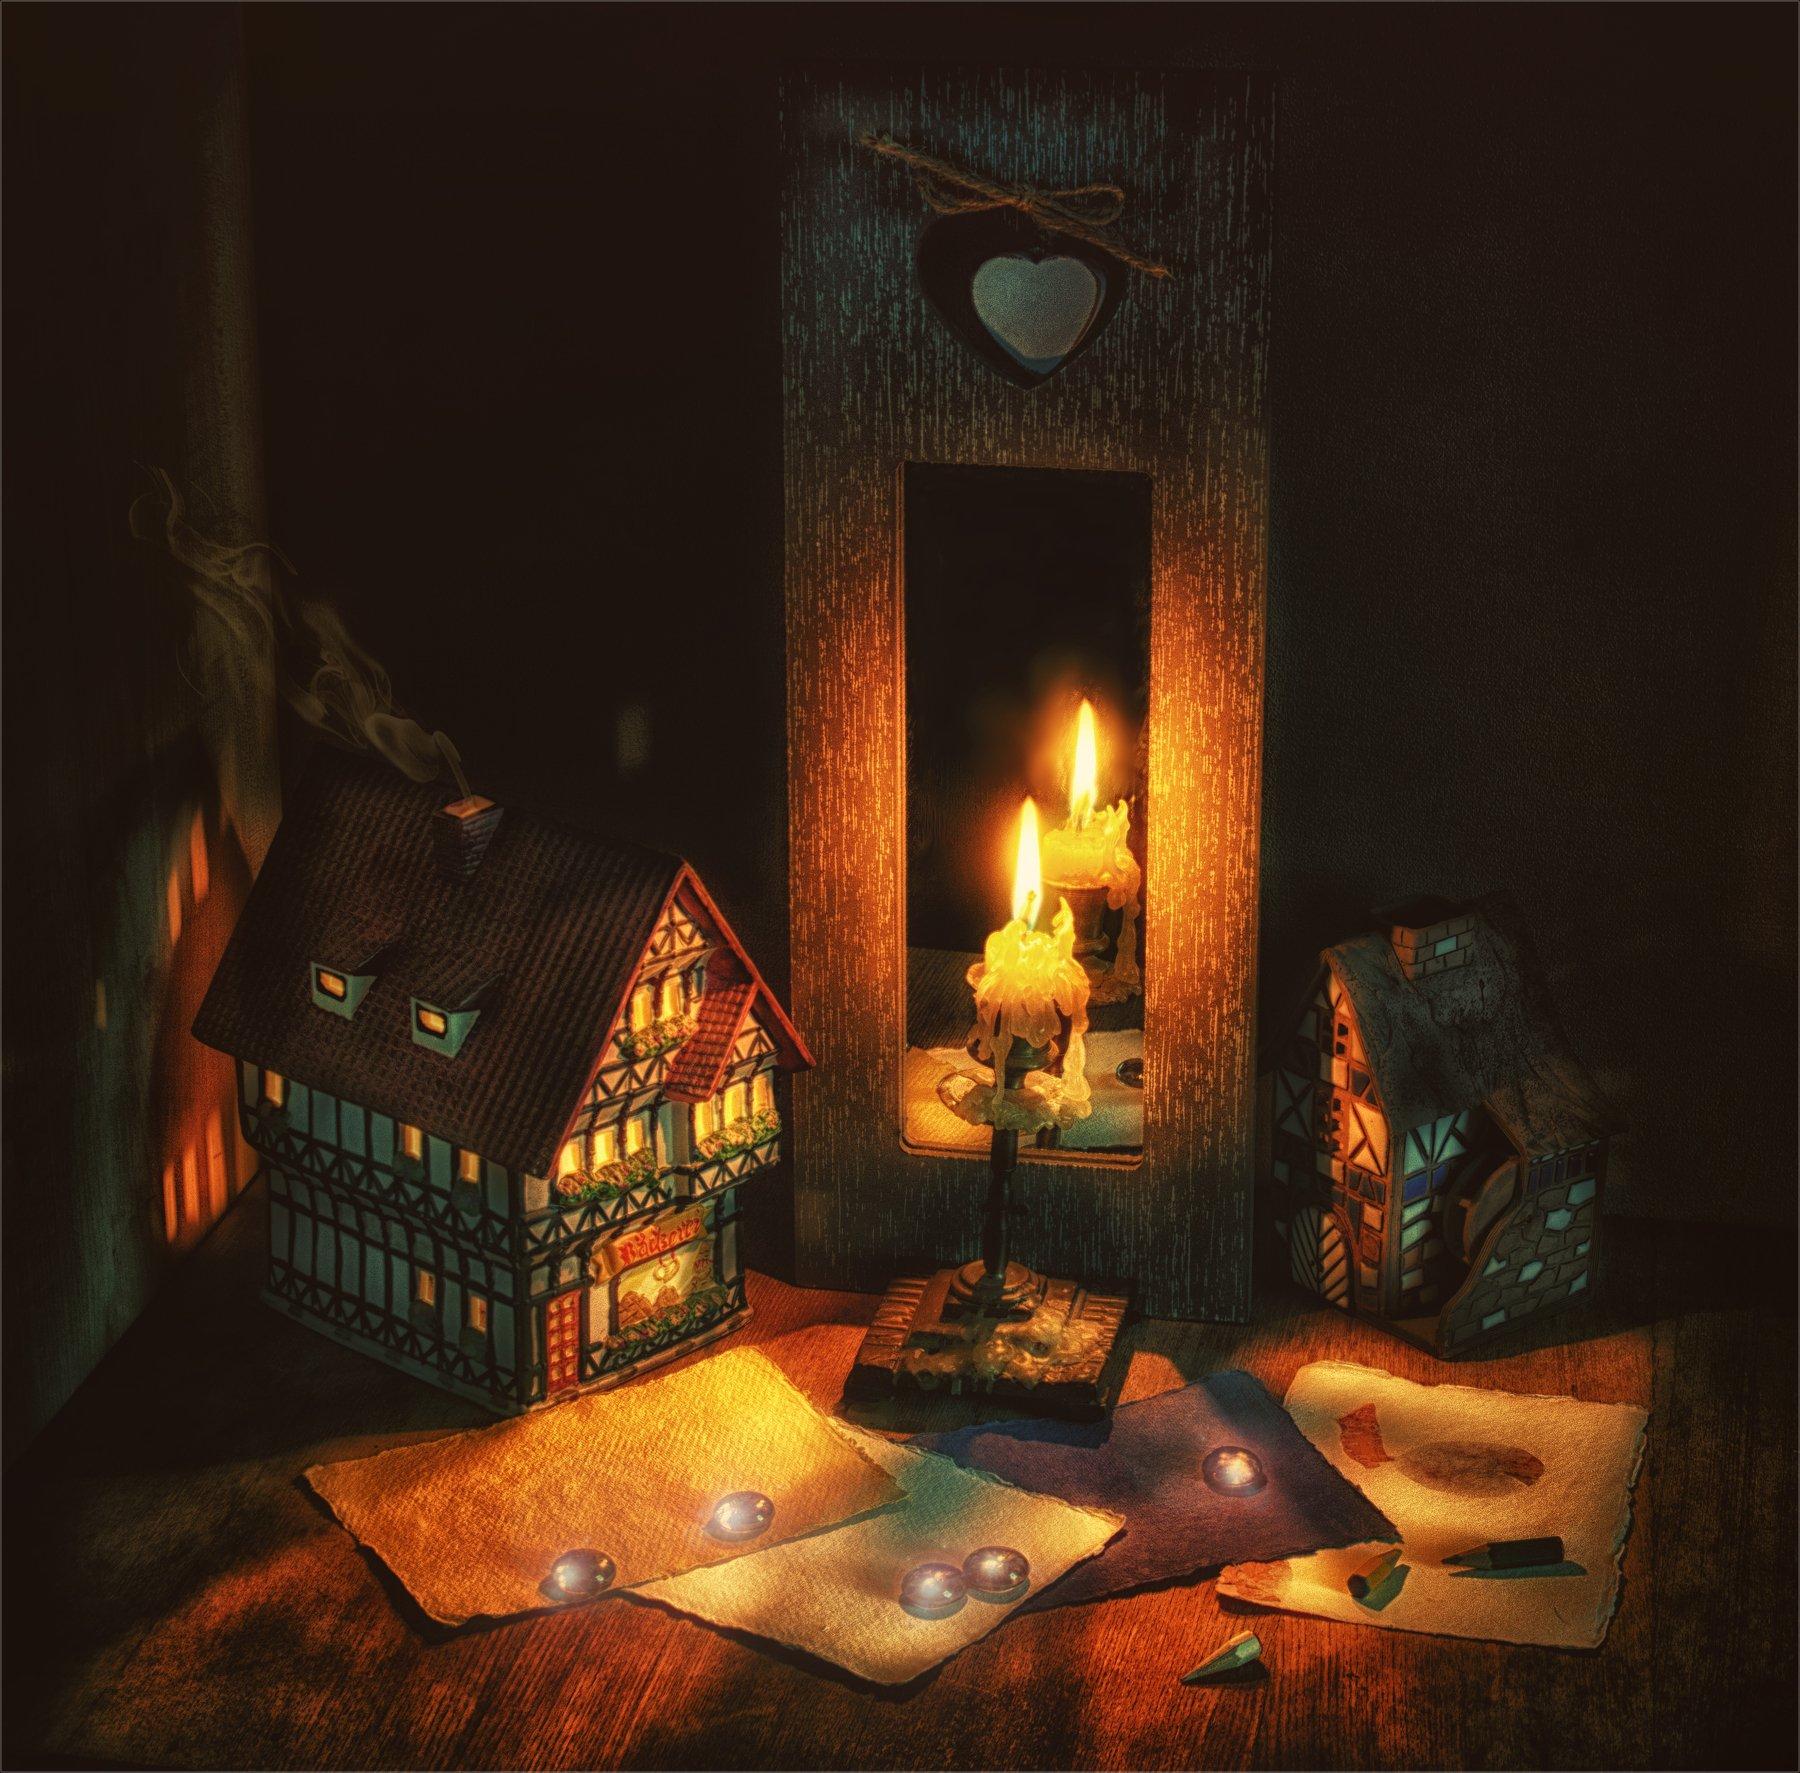 still life, натюрморт,   винтаж, ретро, свеча, огонь, отражение, зеркало, домик, дым, карандаши, Михаил MSH